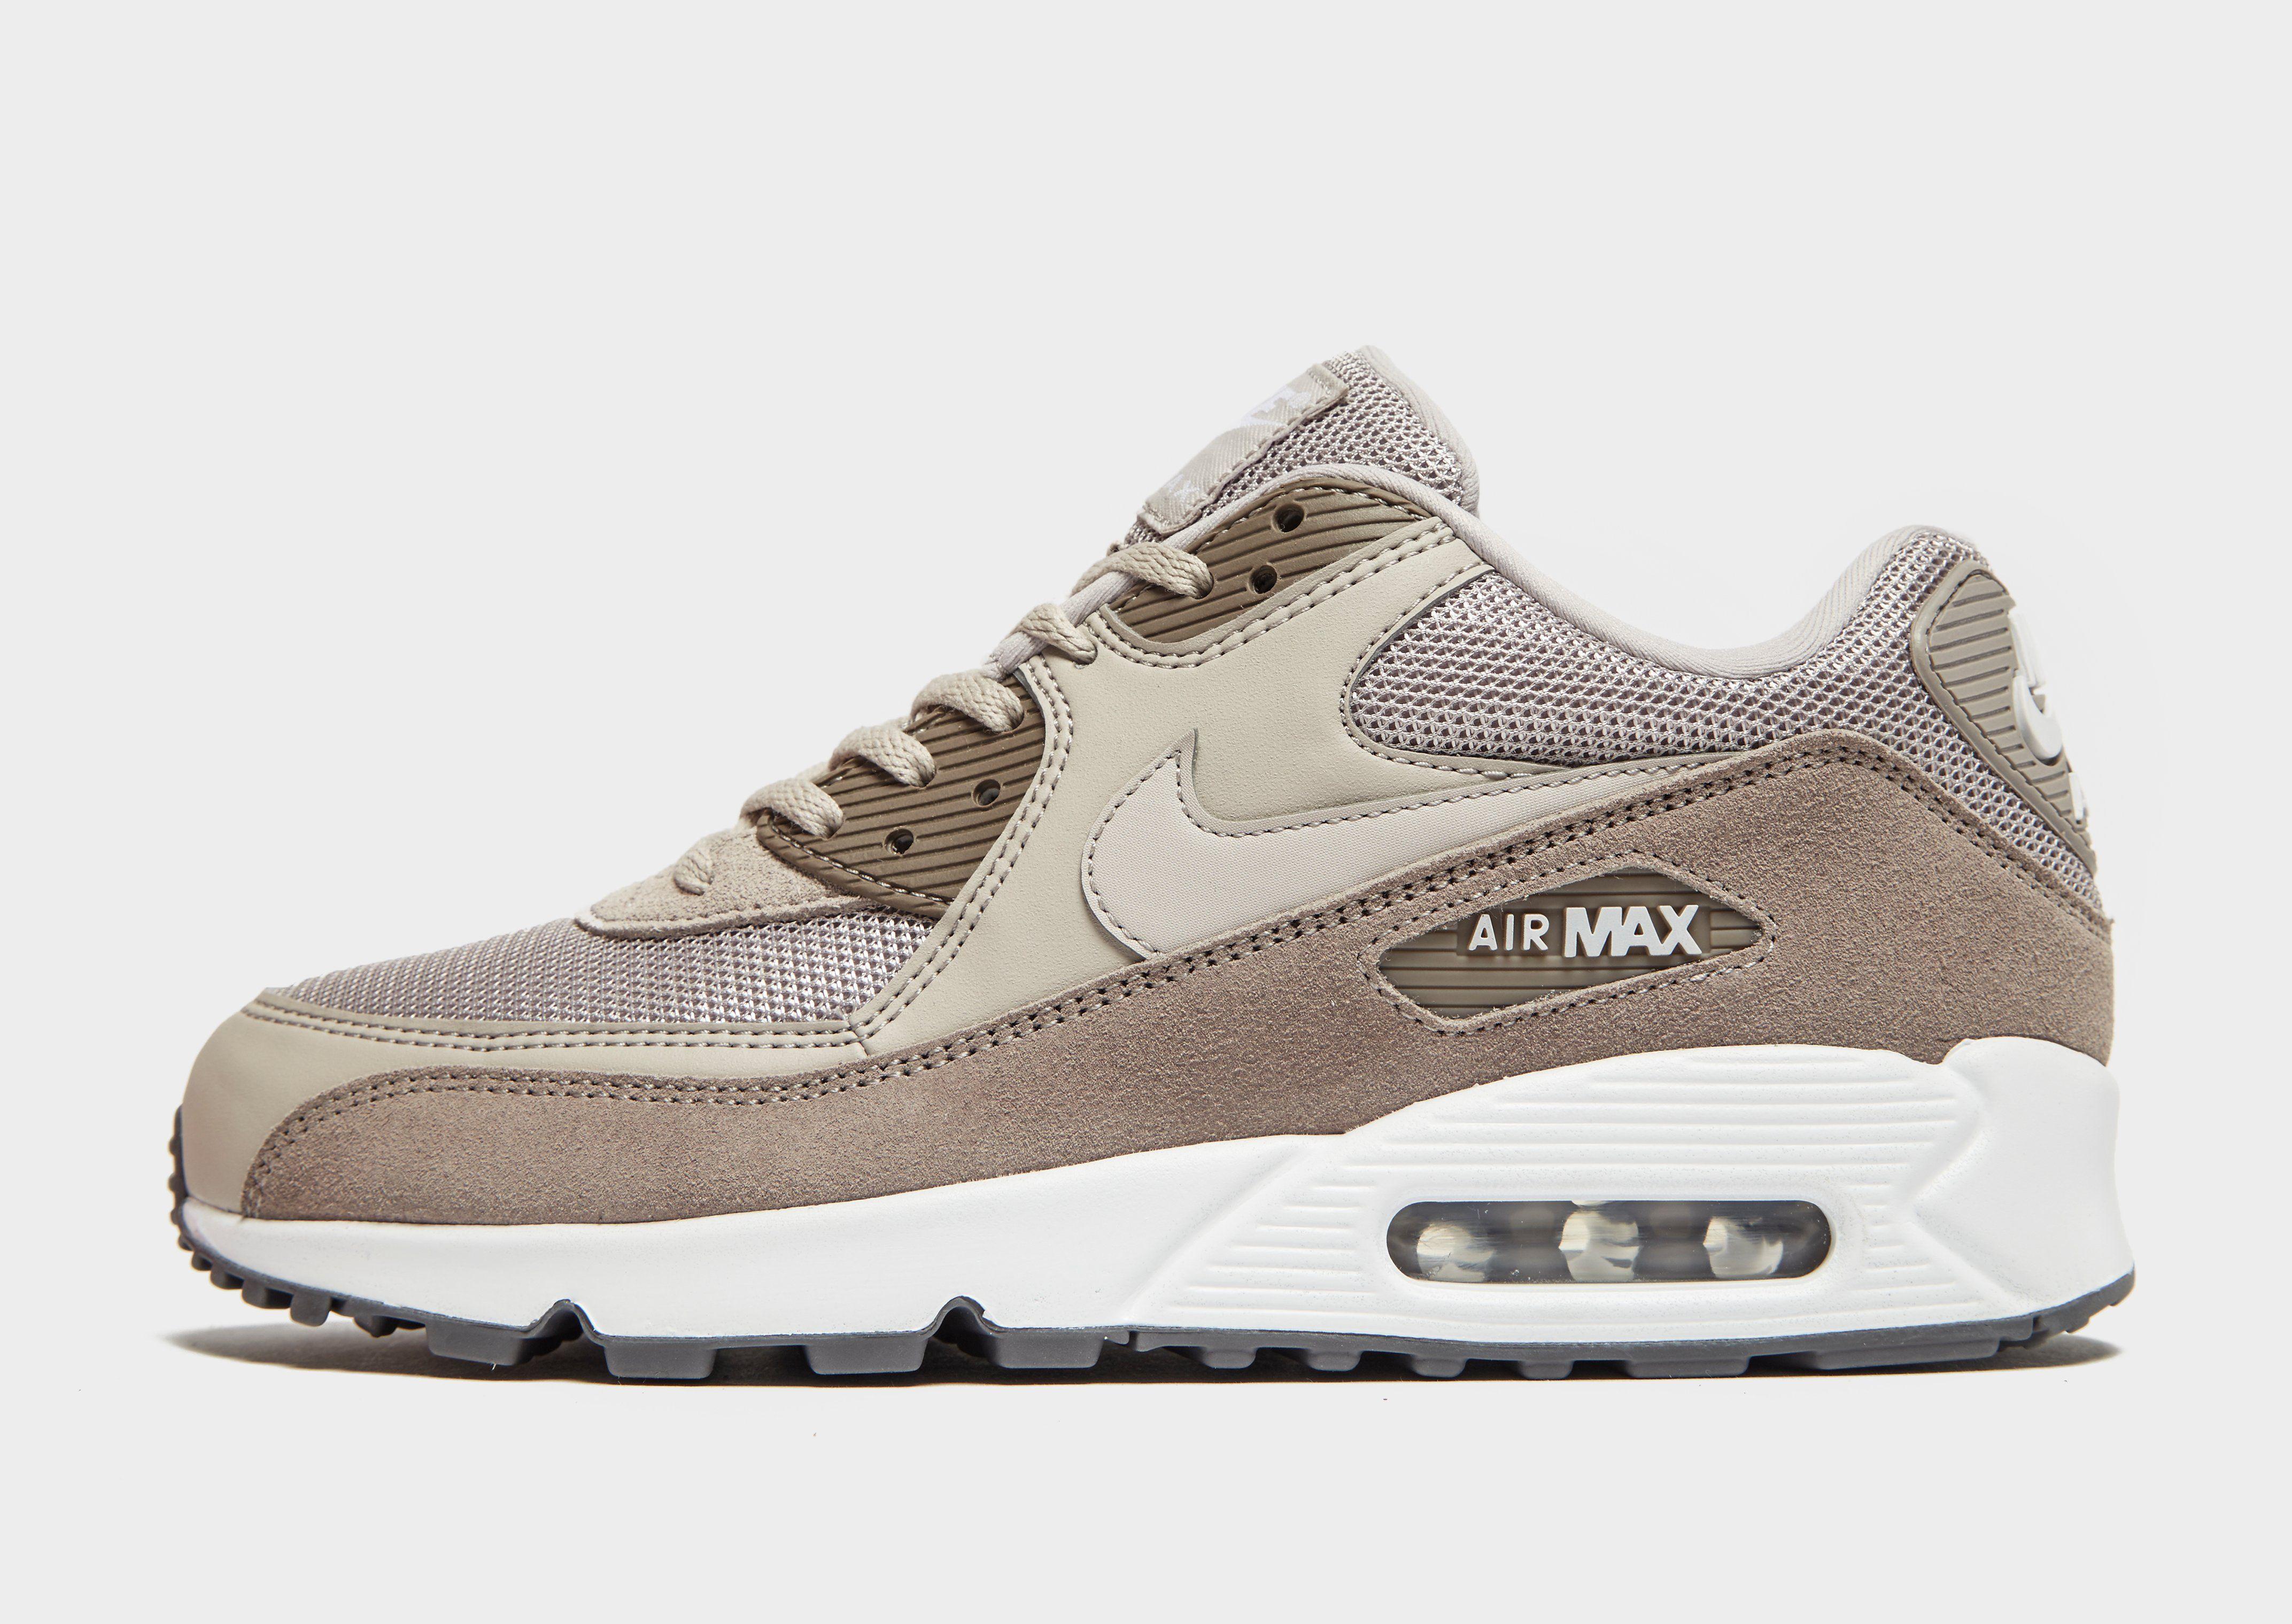 meilleure sélection 591c5 ef185 Nike Air Max 90 Essential | JD Sports